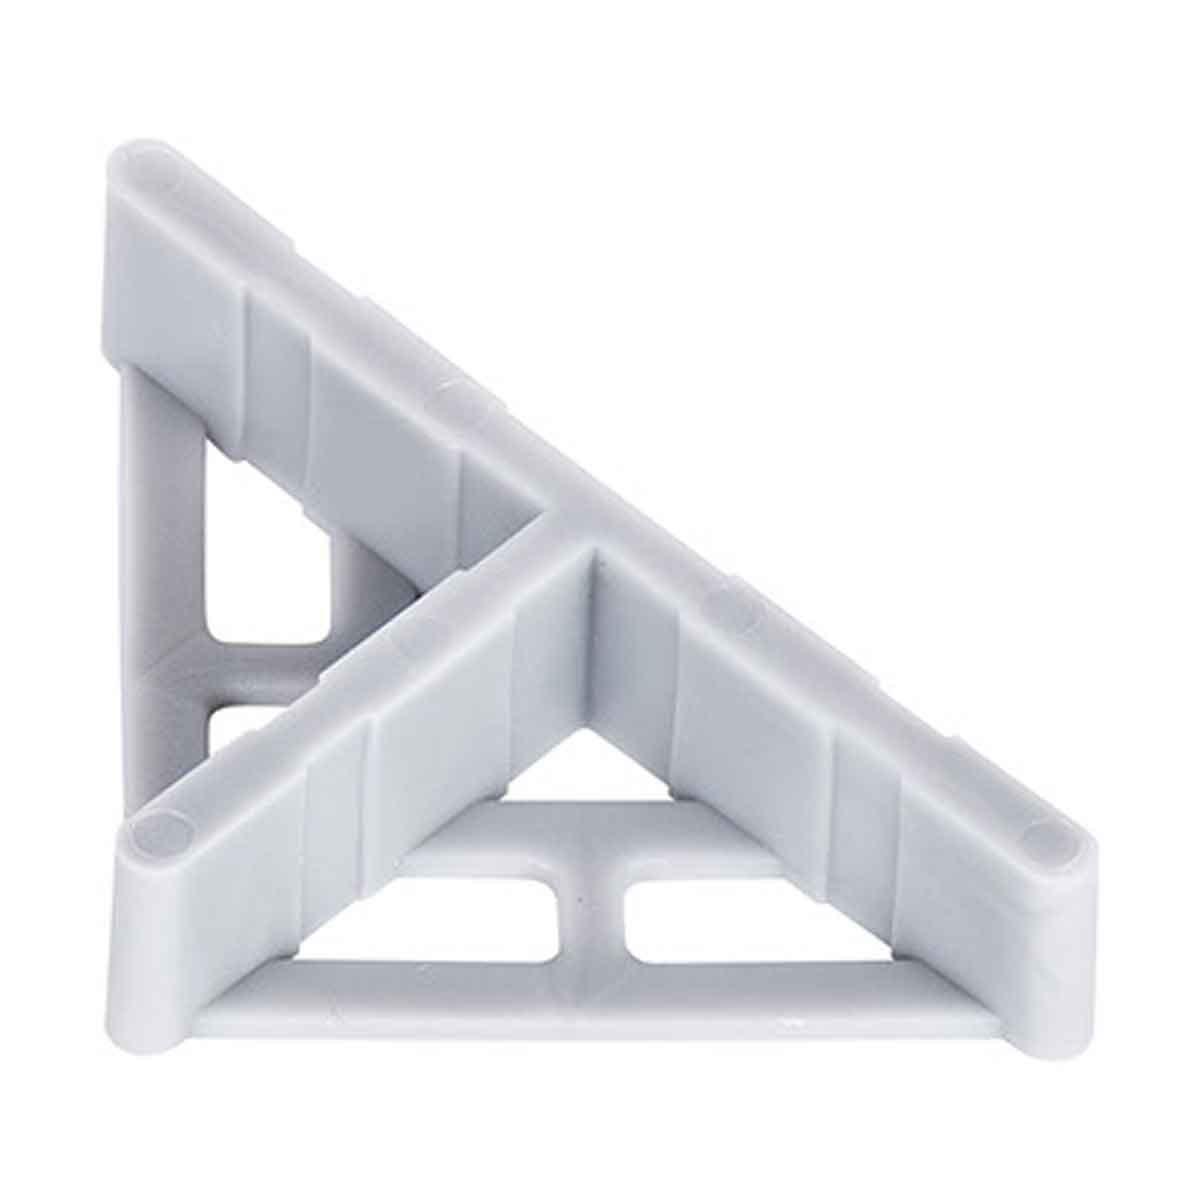 Raimondi 20 mm T Spacers Thick tile